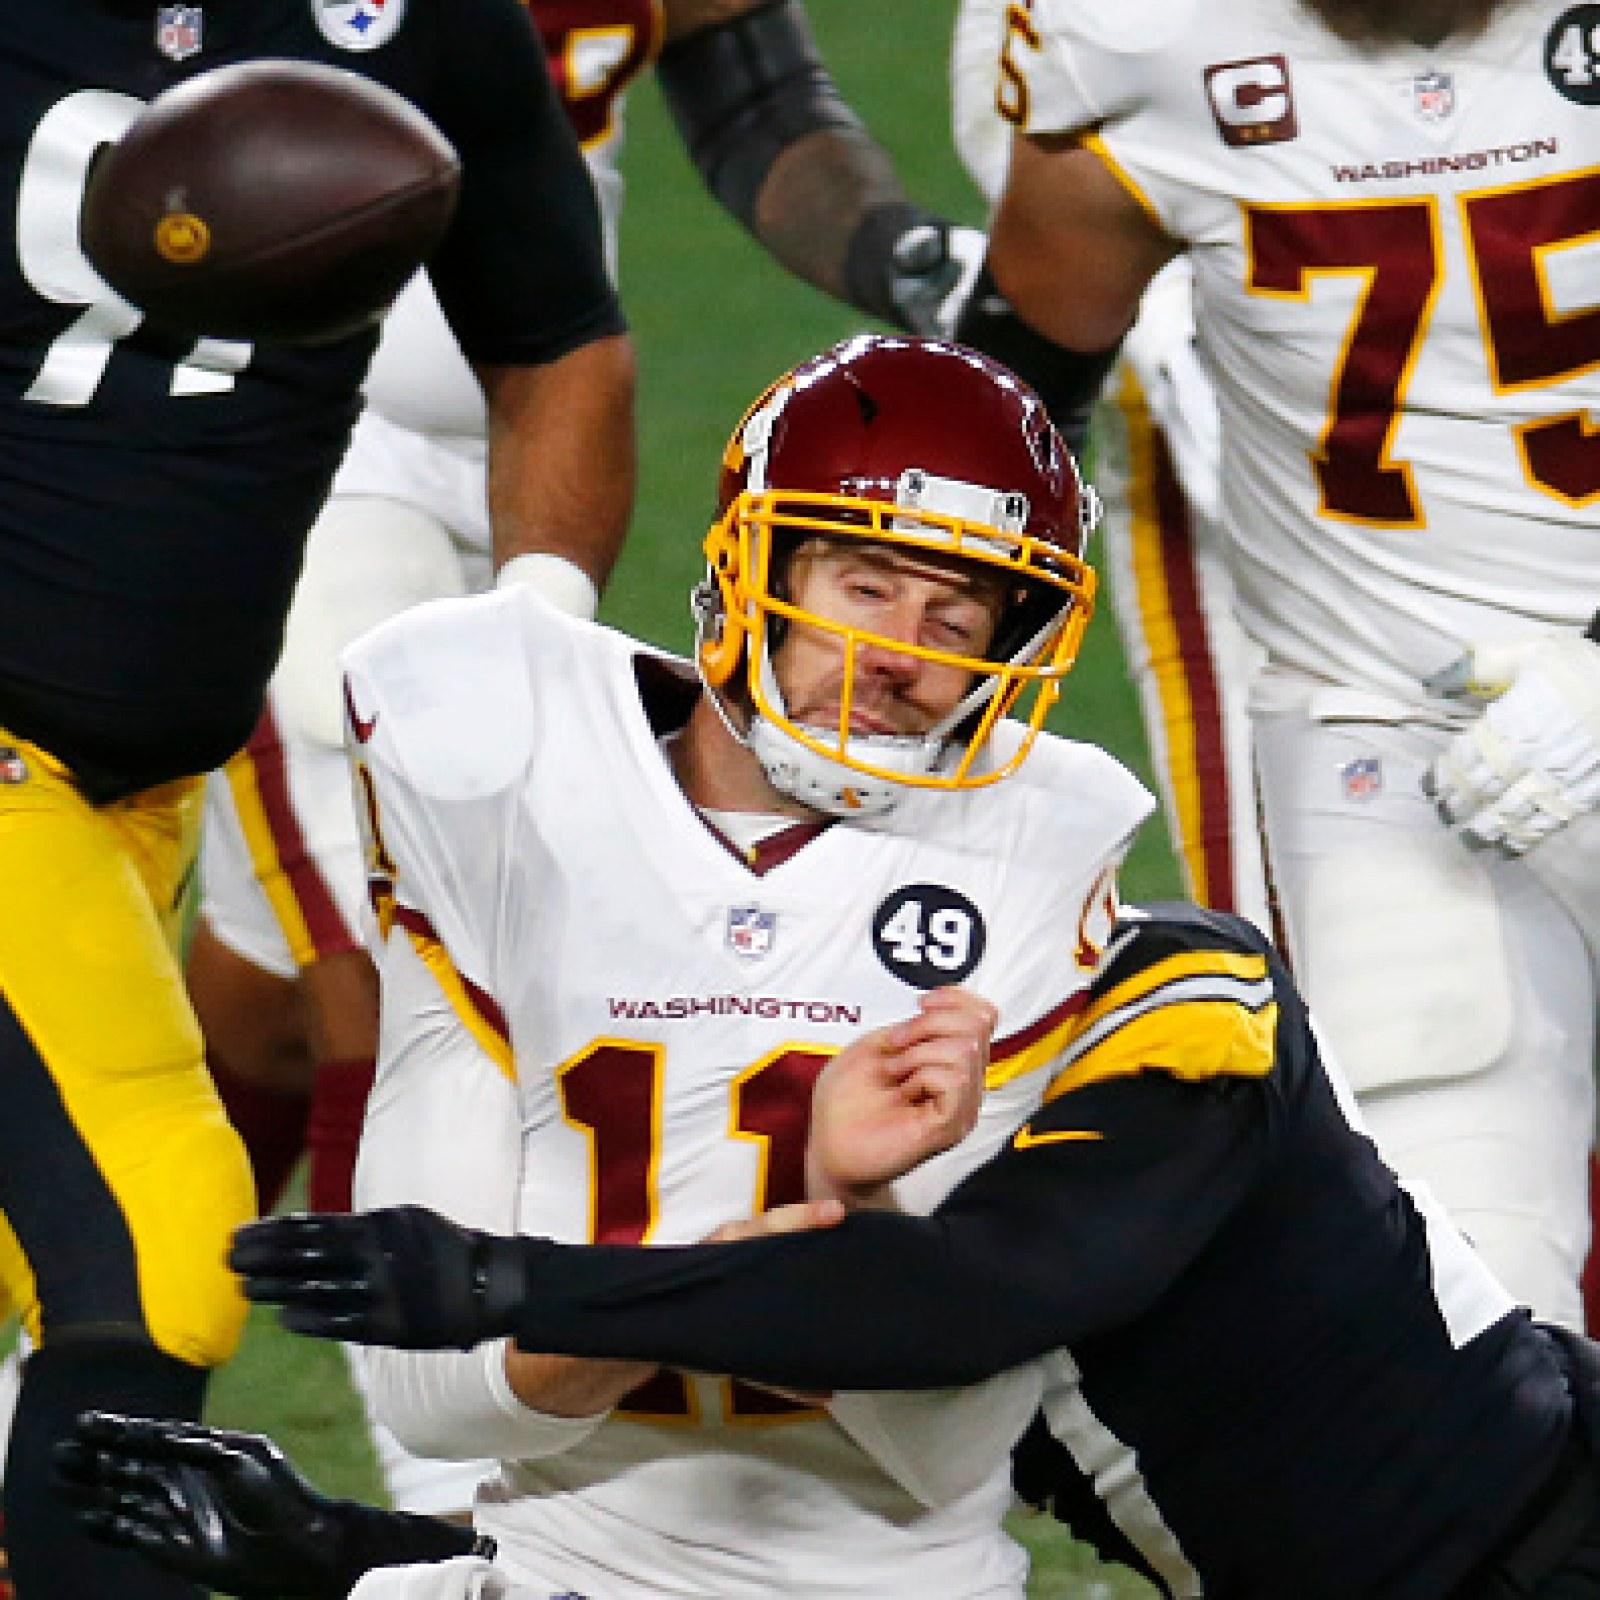 Washington Qb Alex Smith Has Bloody Leg Injury And Returns To Game Social Media Lauds His Toughness